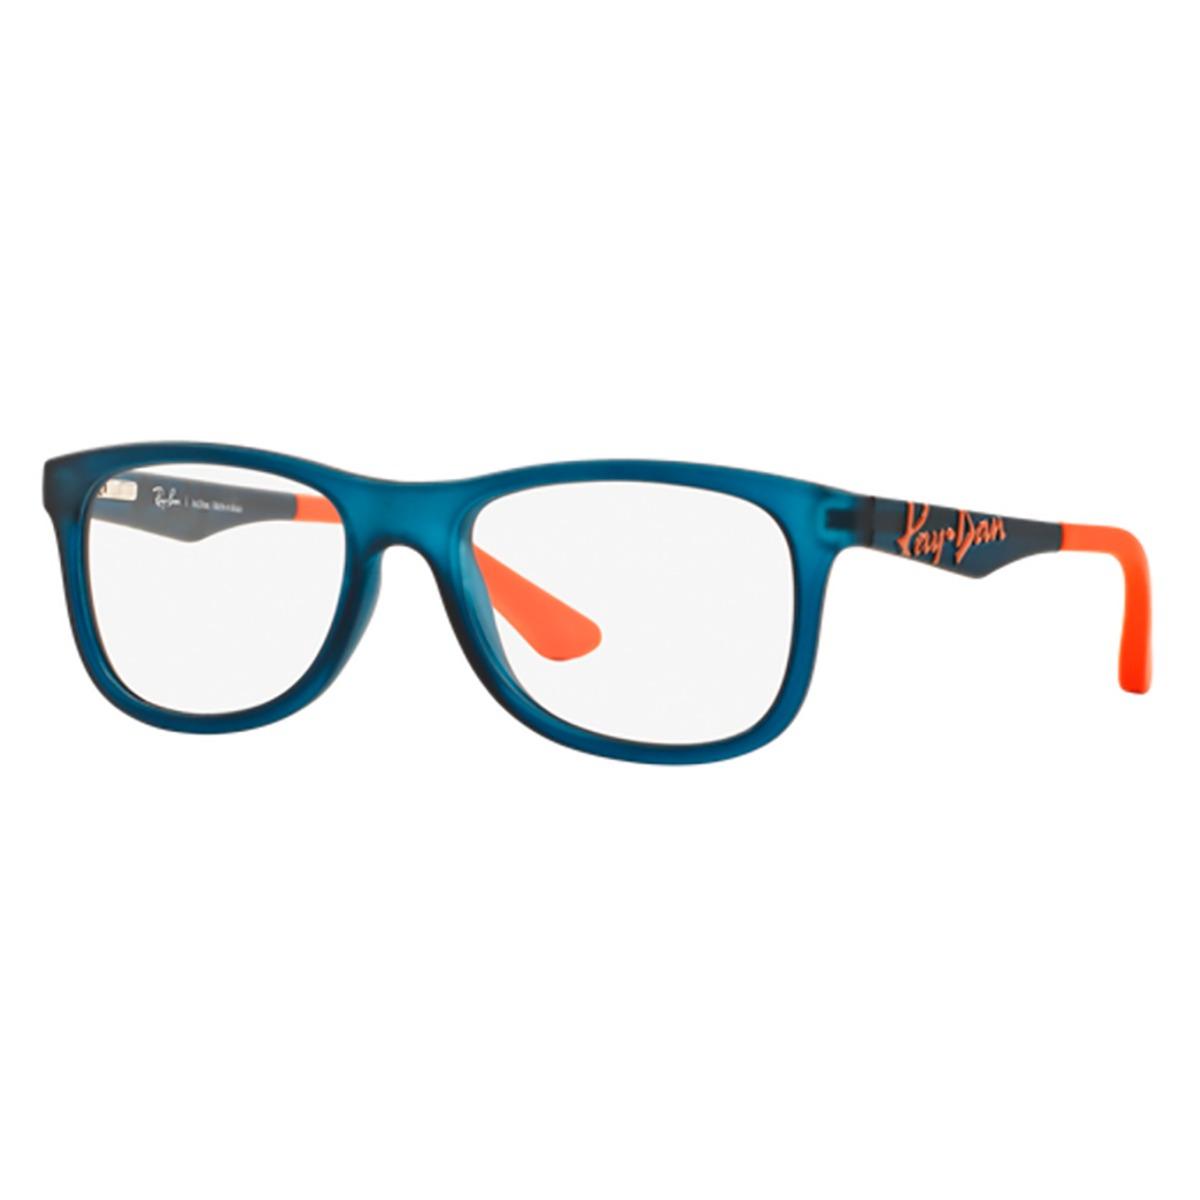 Óculos De Grau Ray Ban Infantil   Rb1551l 3626 - R  328,00 em ... 8567266394